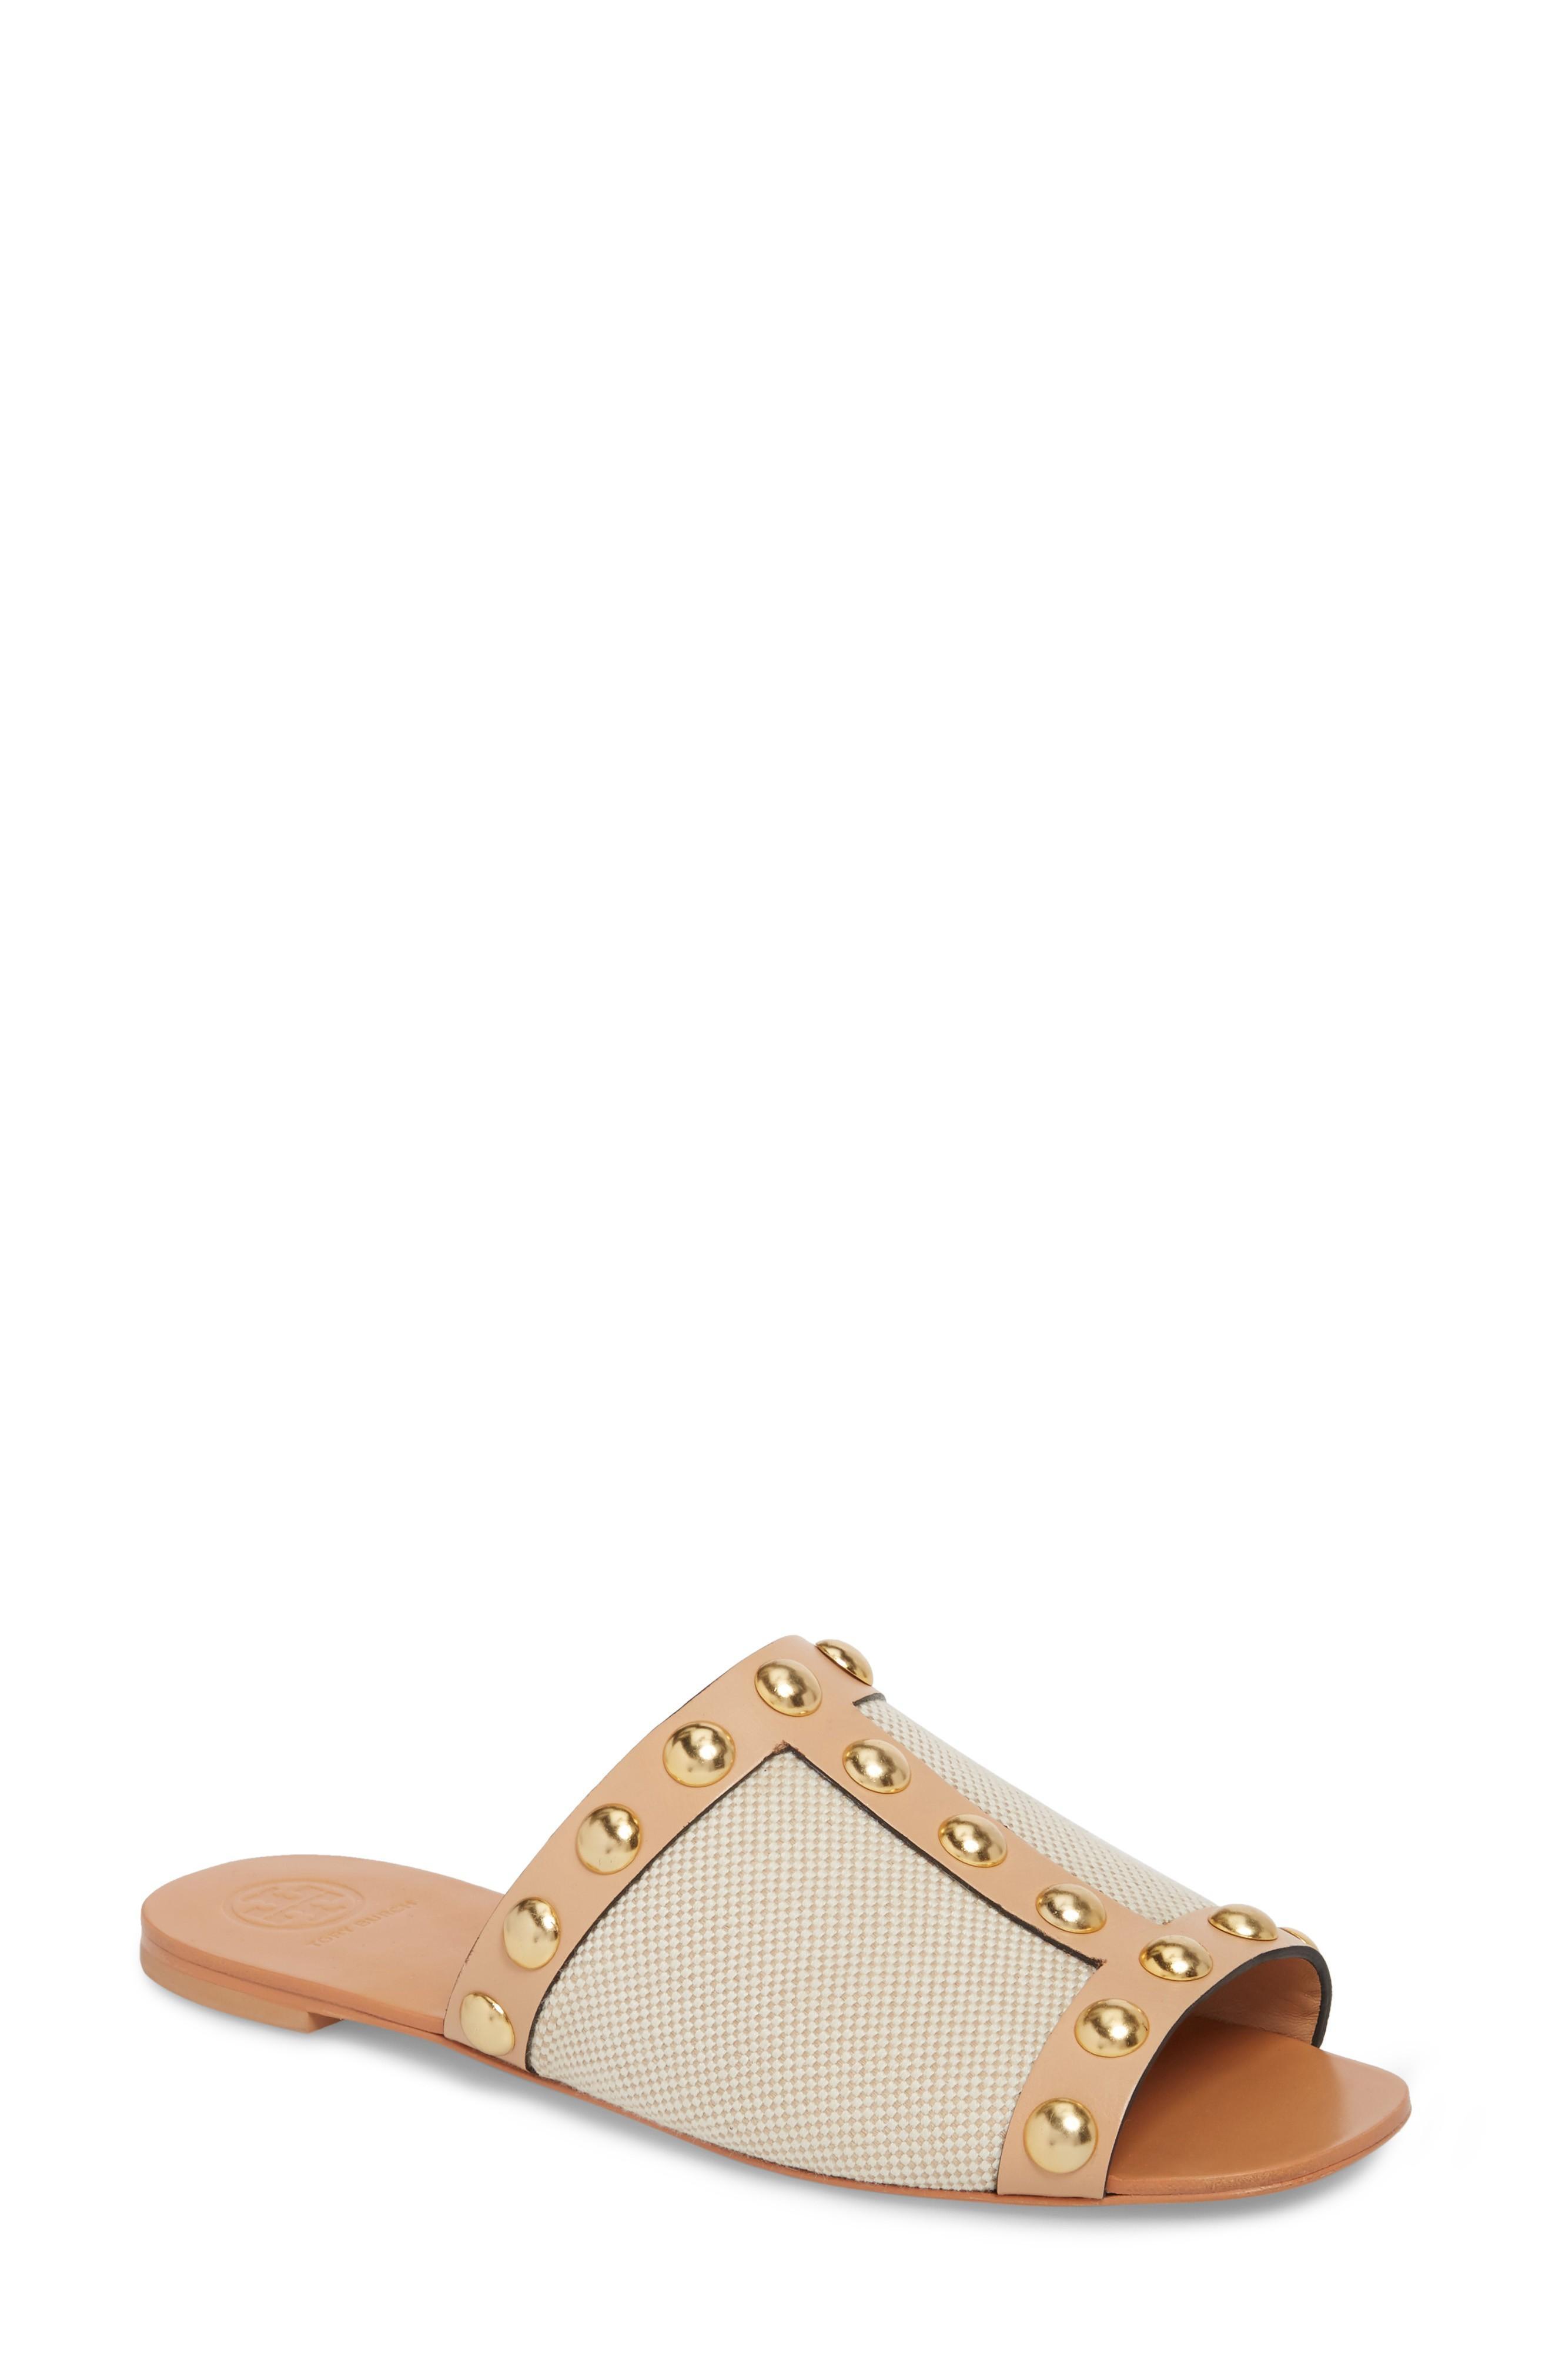 aefdc05c19a Tory Burch Blythe Slide Sandal In Sand  Natural Vachetta